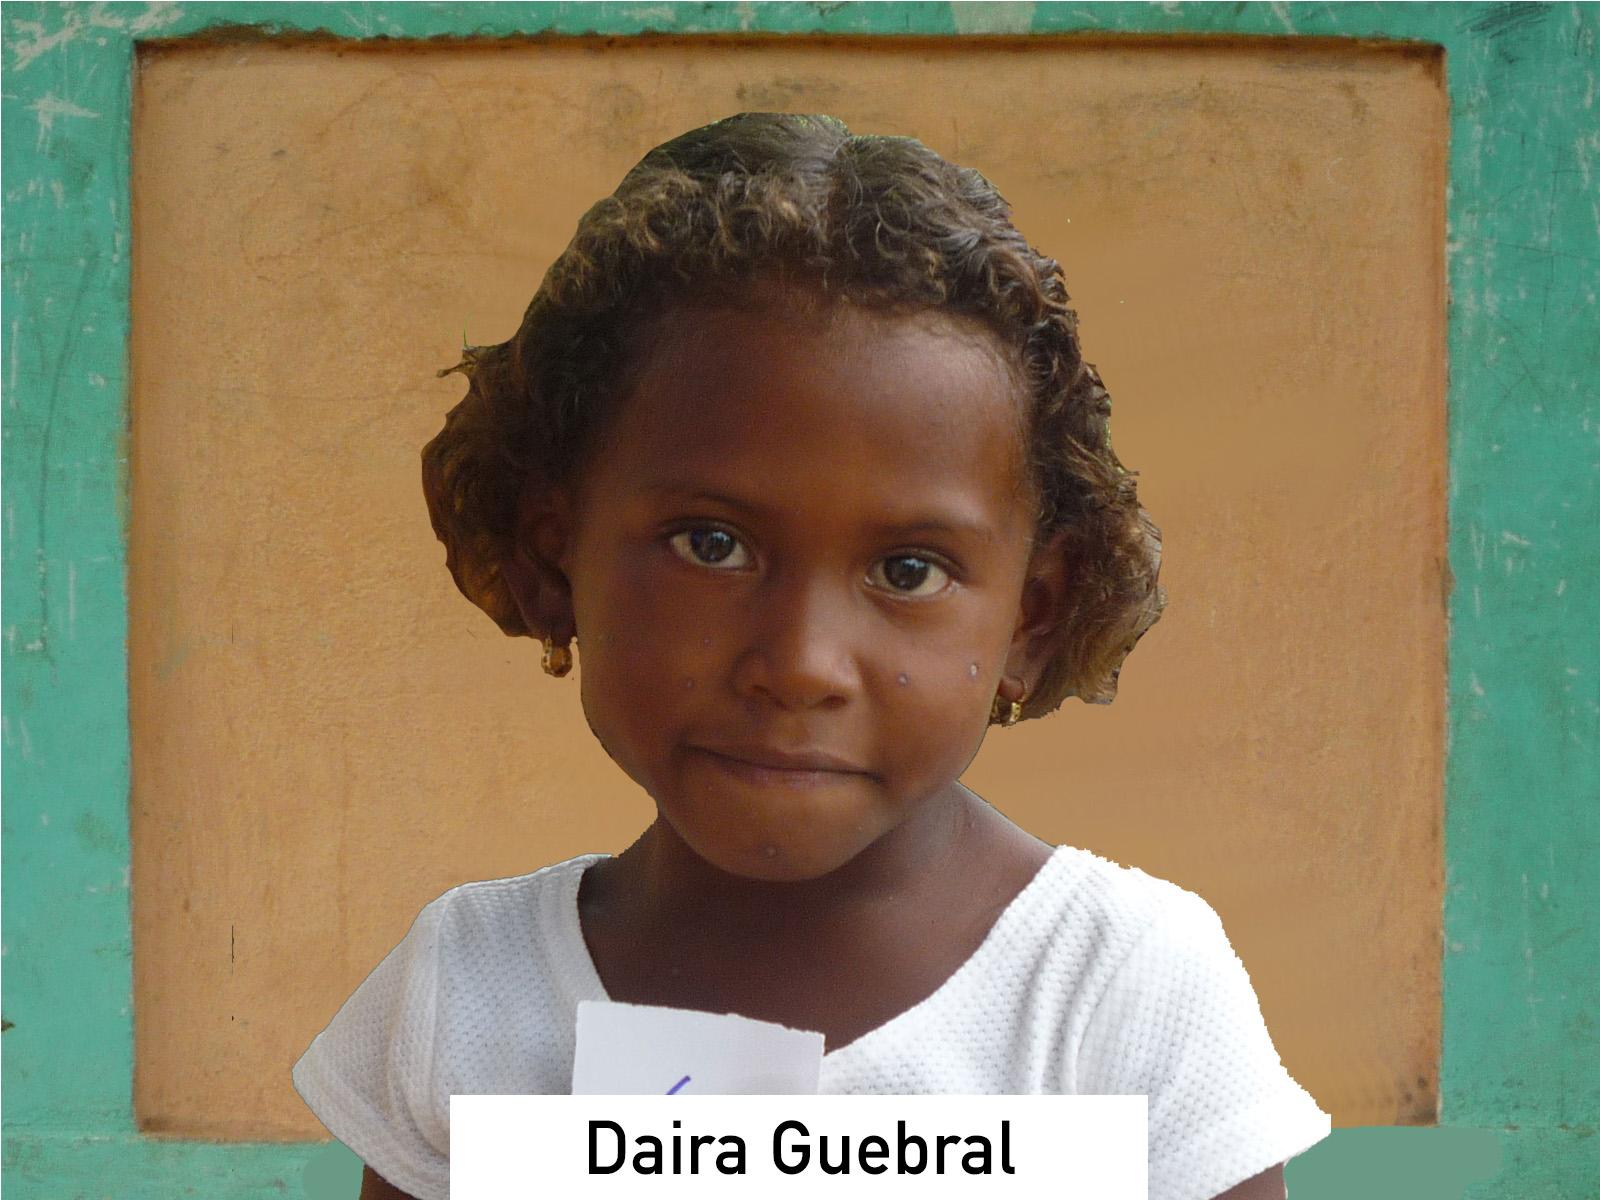 068 - Daira Guebral.jpg